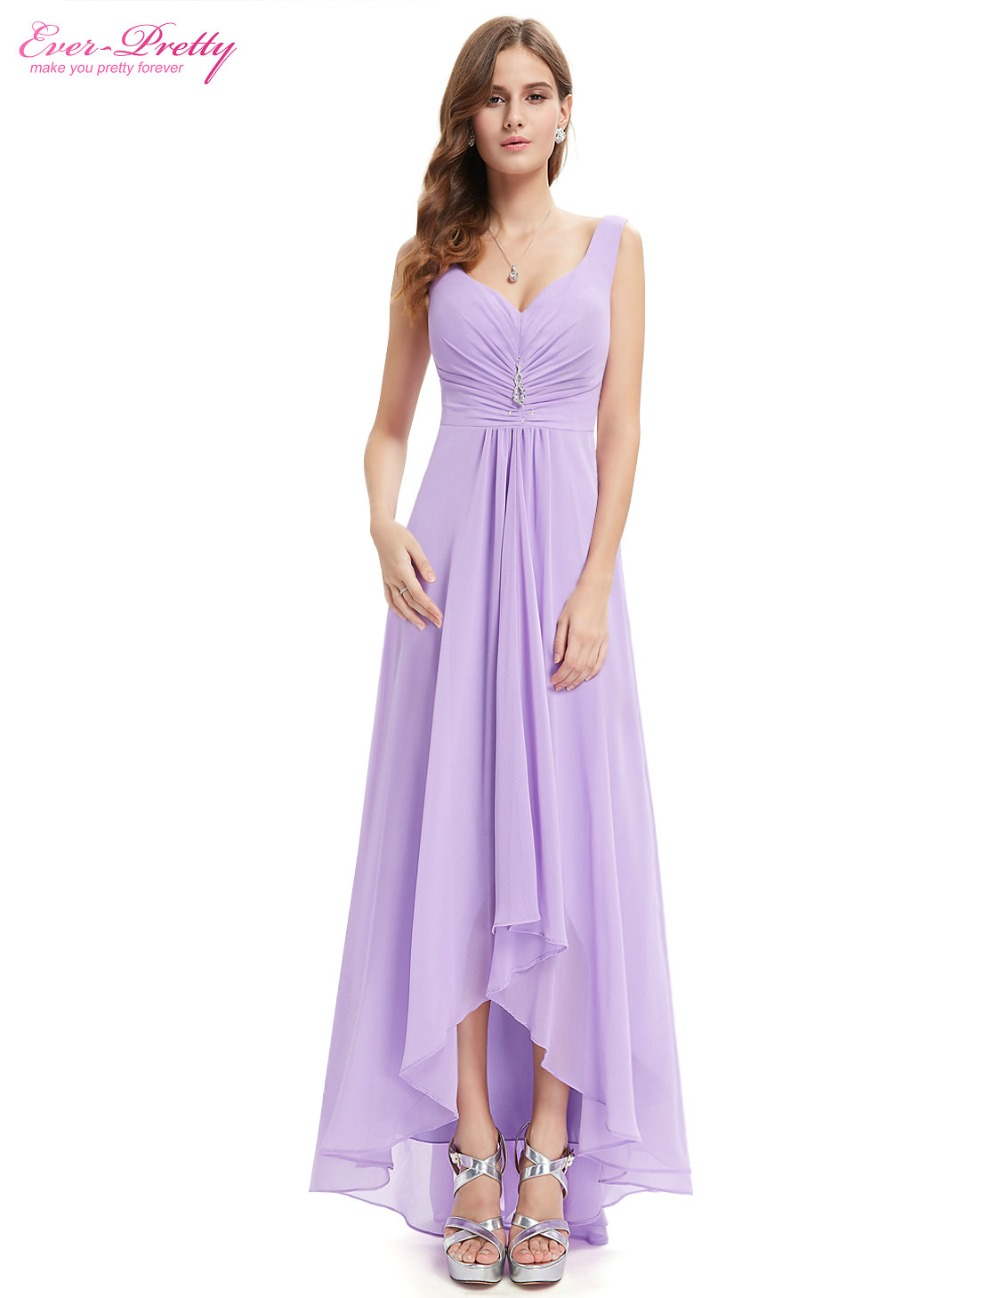 Niedlich Beautiful Plus Size Prom Dresses Fotos - Hochzeit Kleid ...